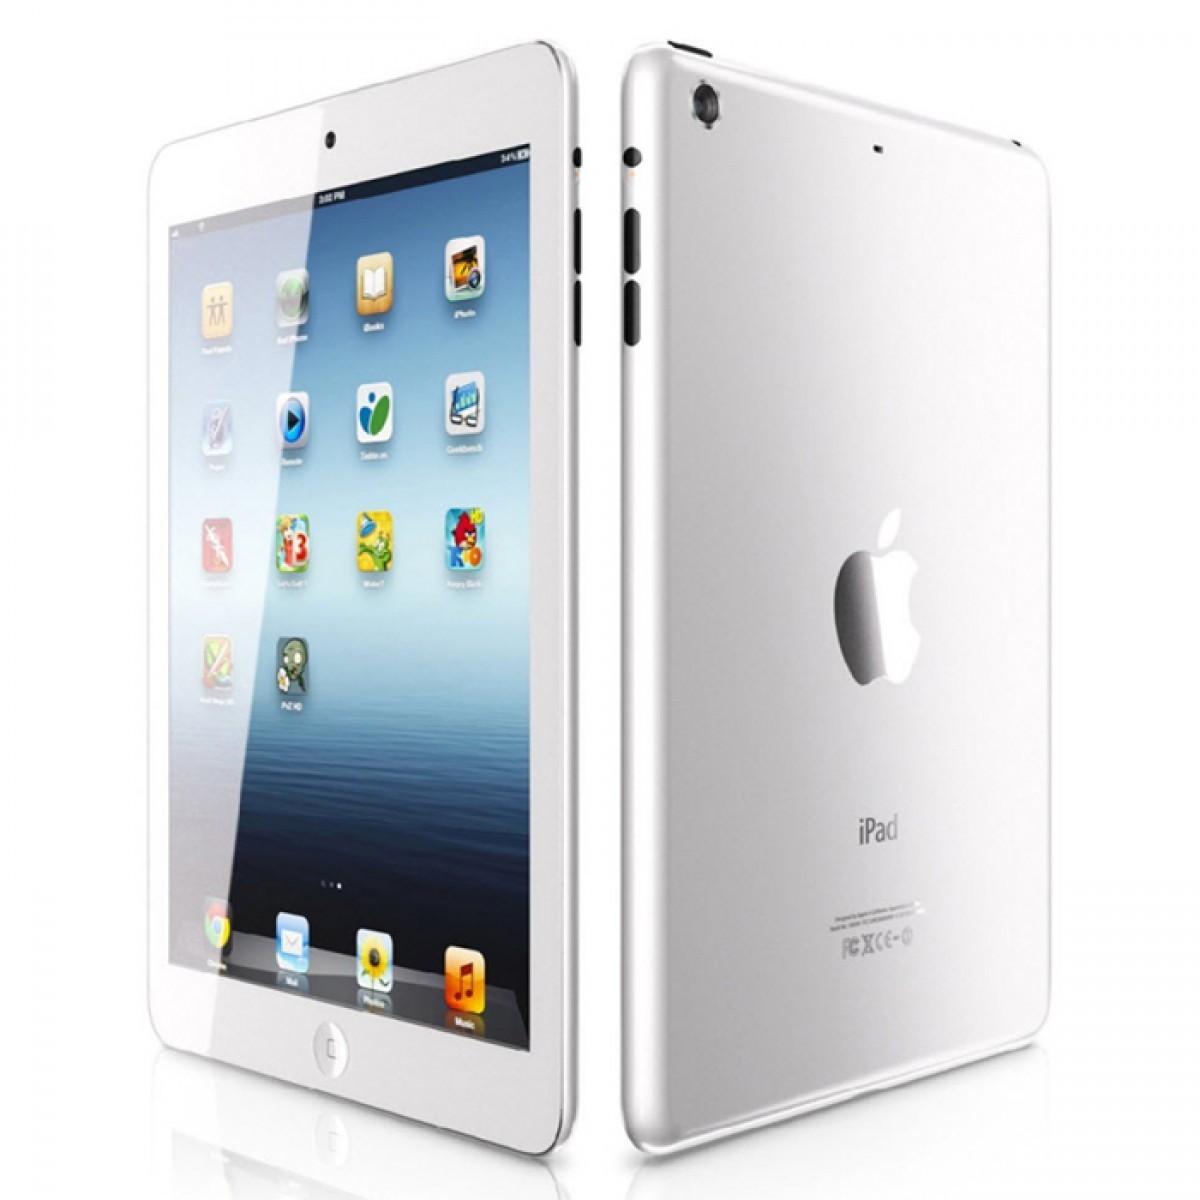 tonpc ma vente mat riel mac au maroc apple tablette ipad. Black Bedroom Furniture Sets. Home Design Ideas